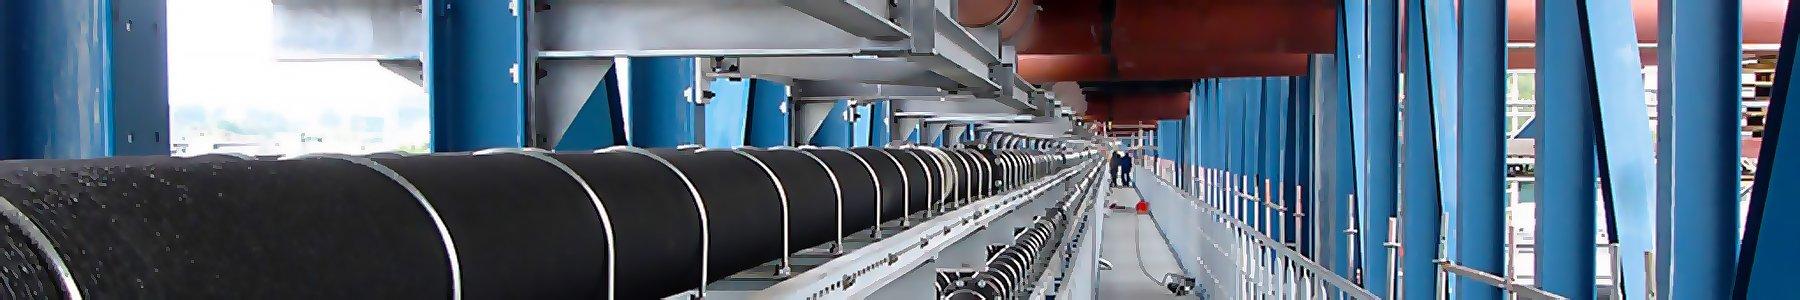 Hydrostatic Testing Companies | Pipeline Hydrostatic Testing